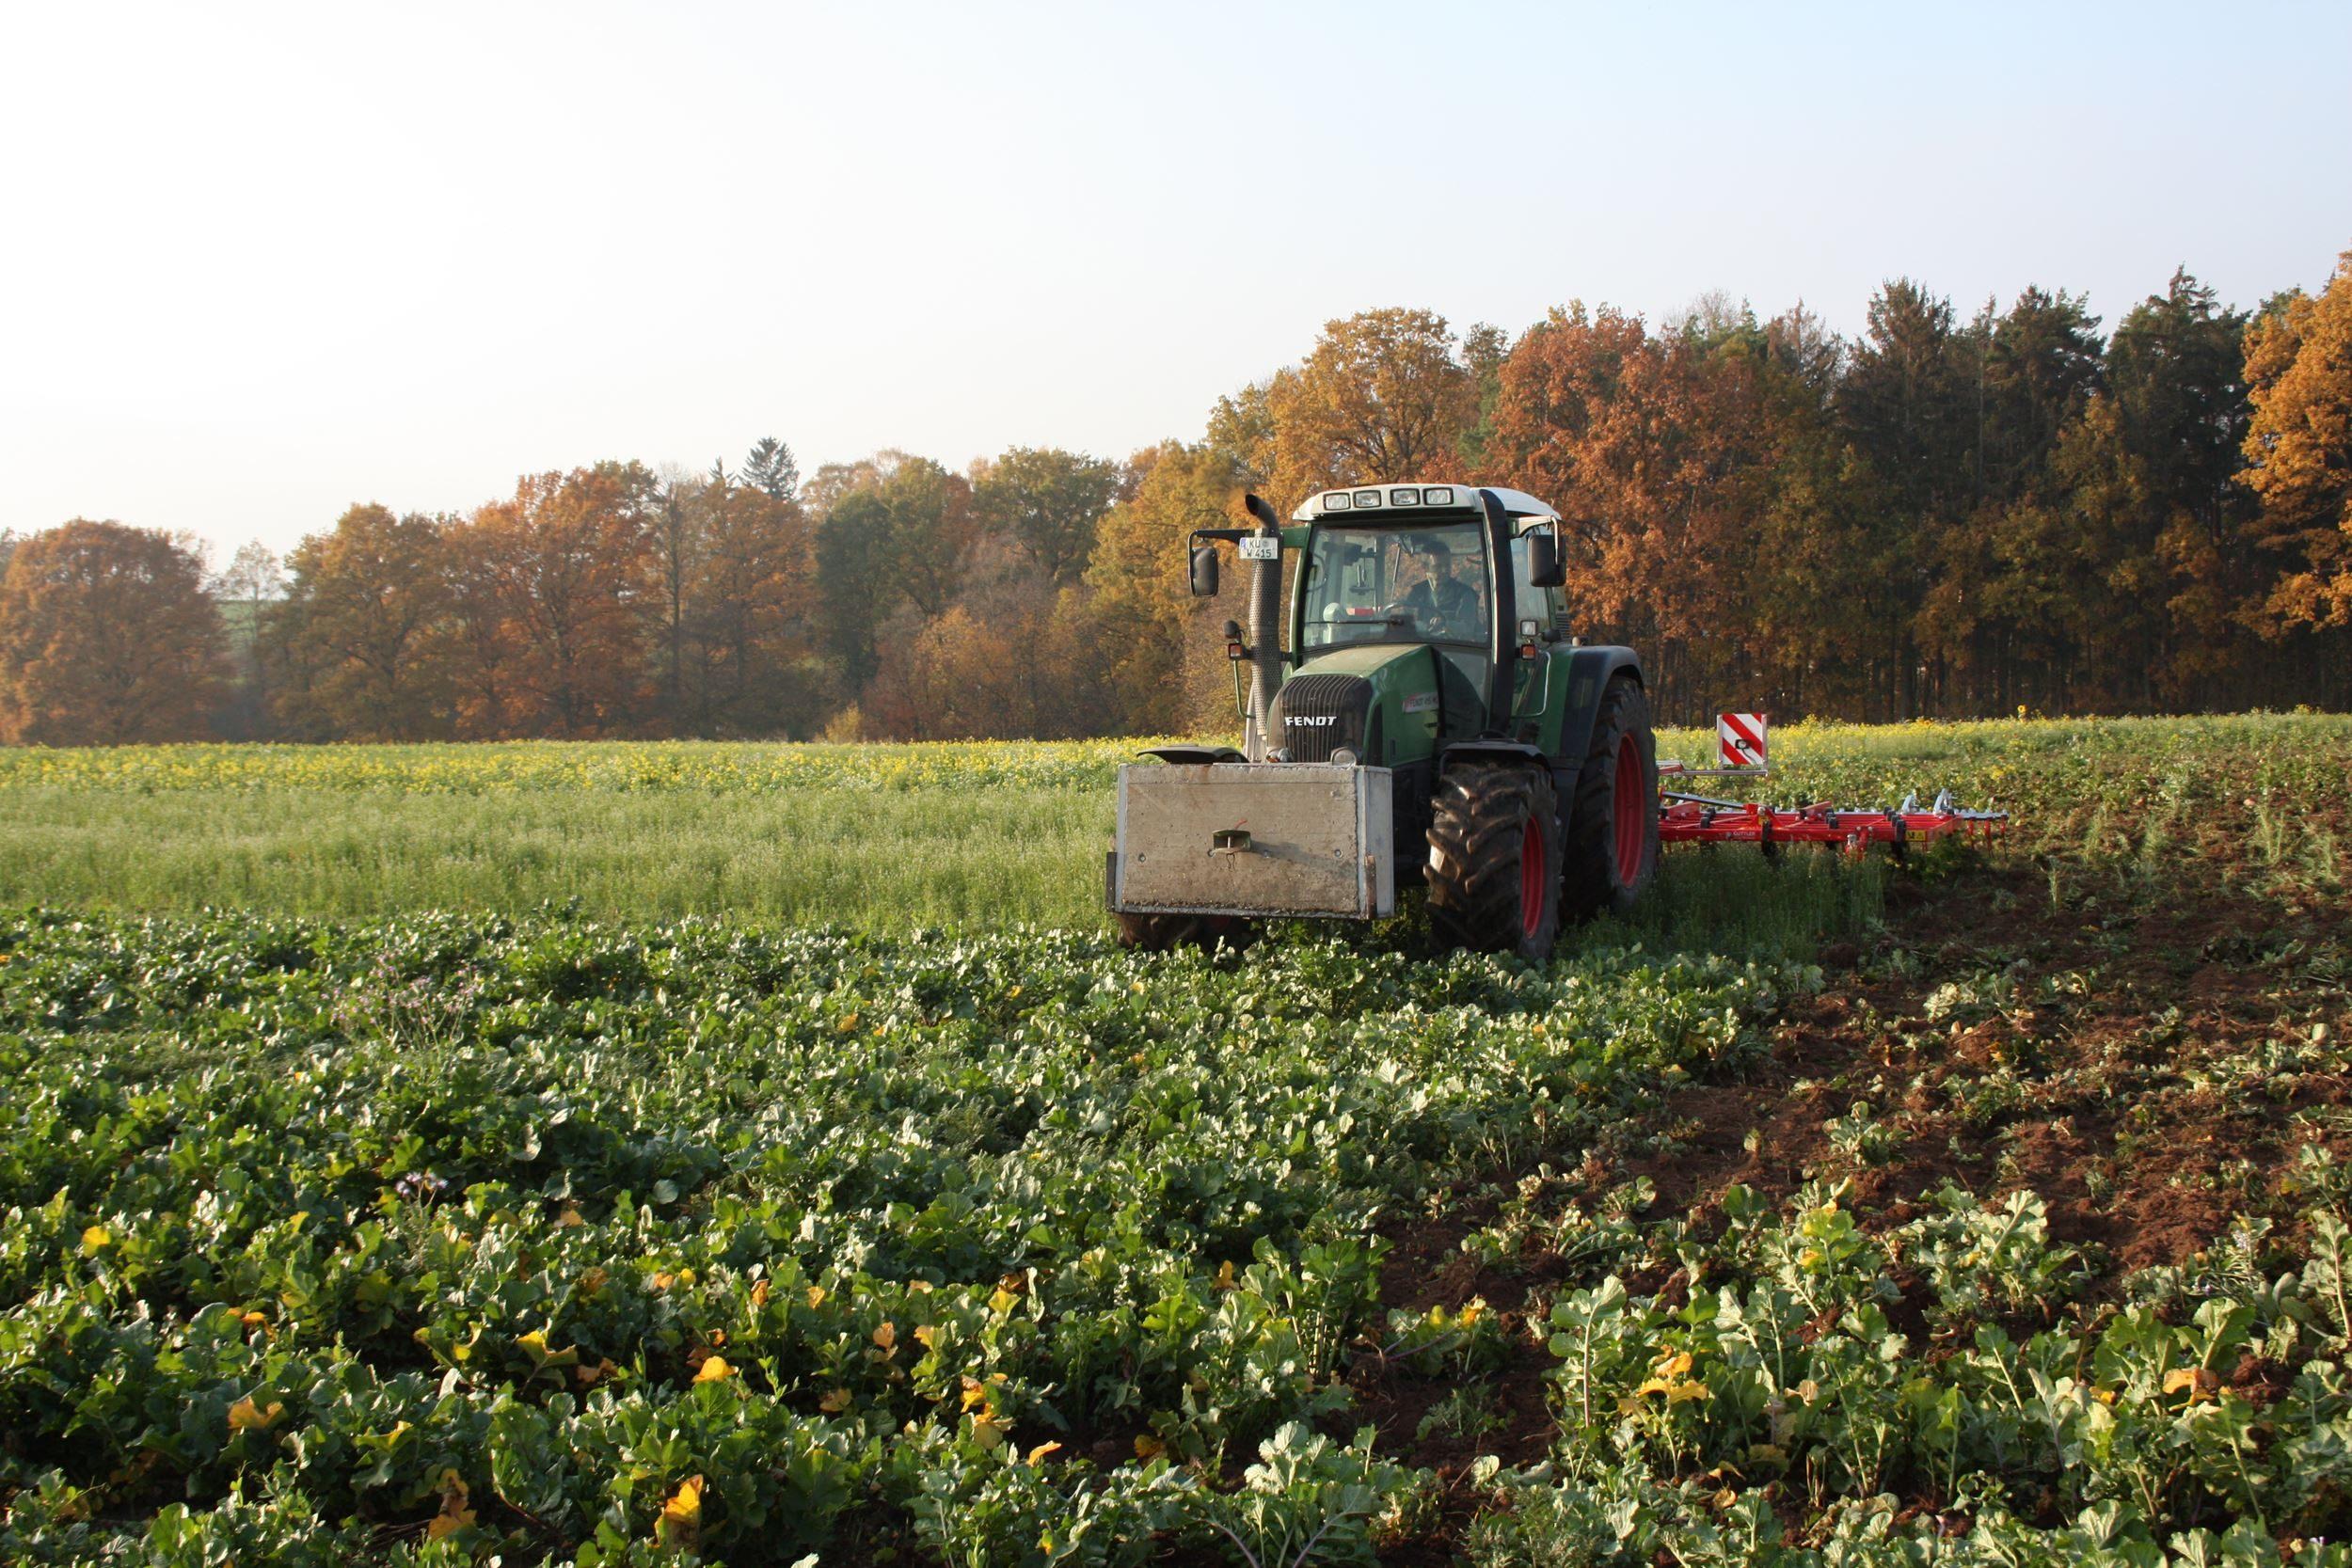 Dossier: groenbemesters: vernietiging van groenbemester: Cultivator